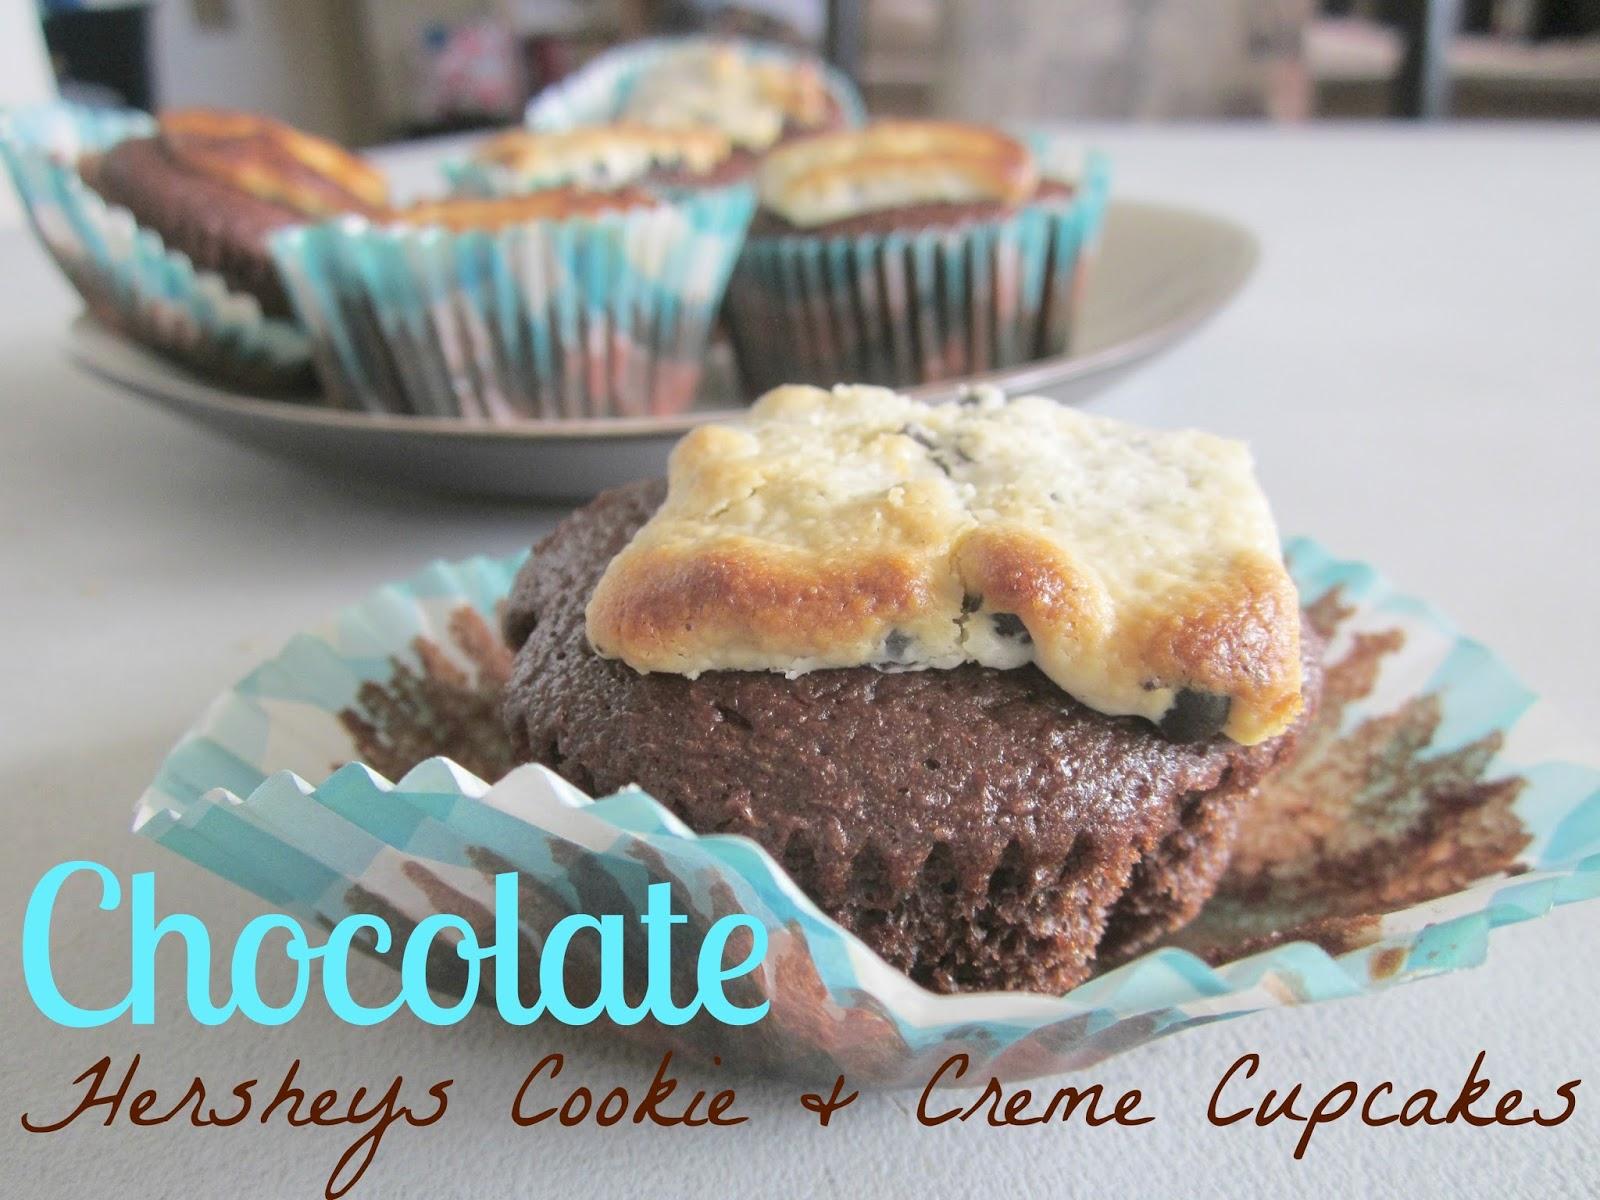 chocolate hersheys cookie and creme cupcakes